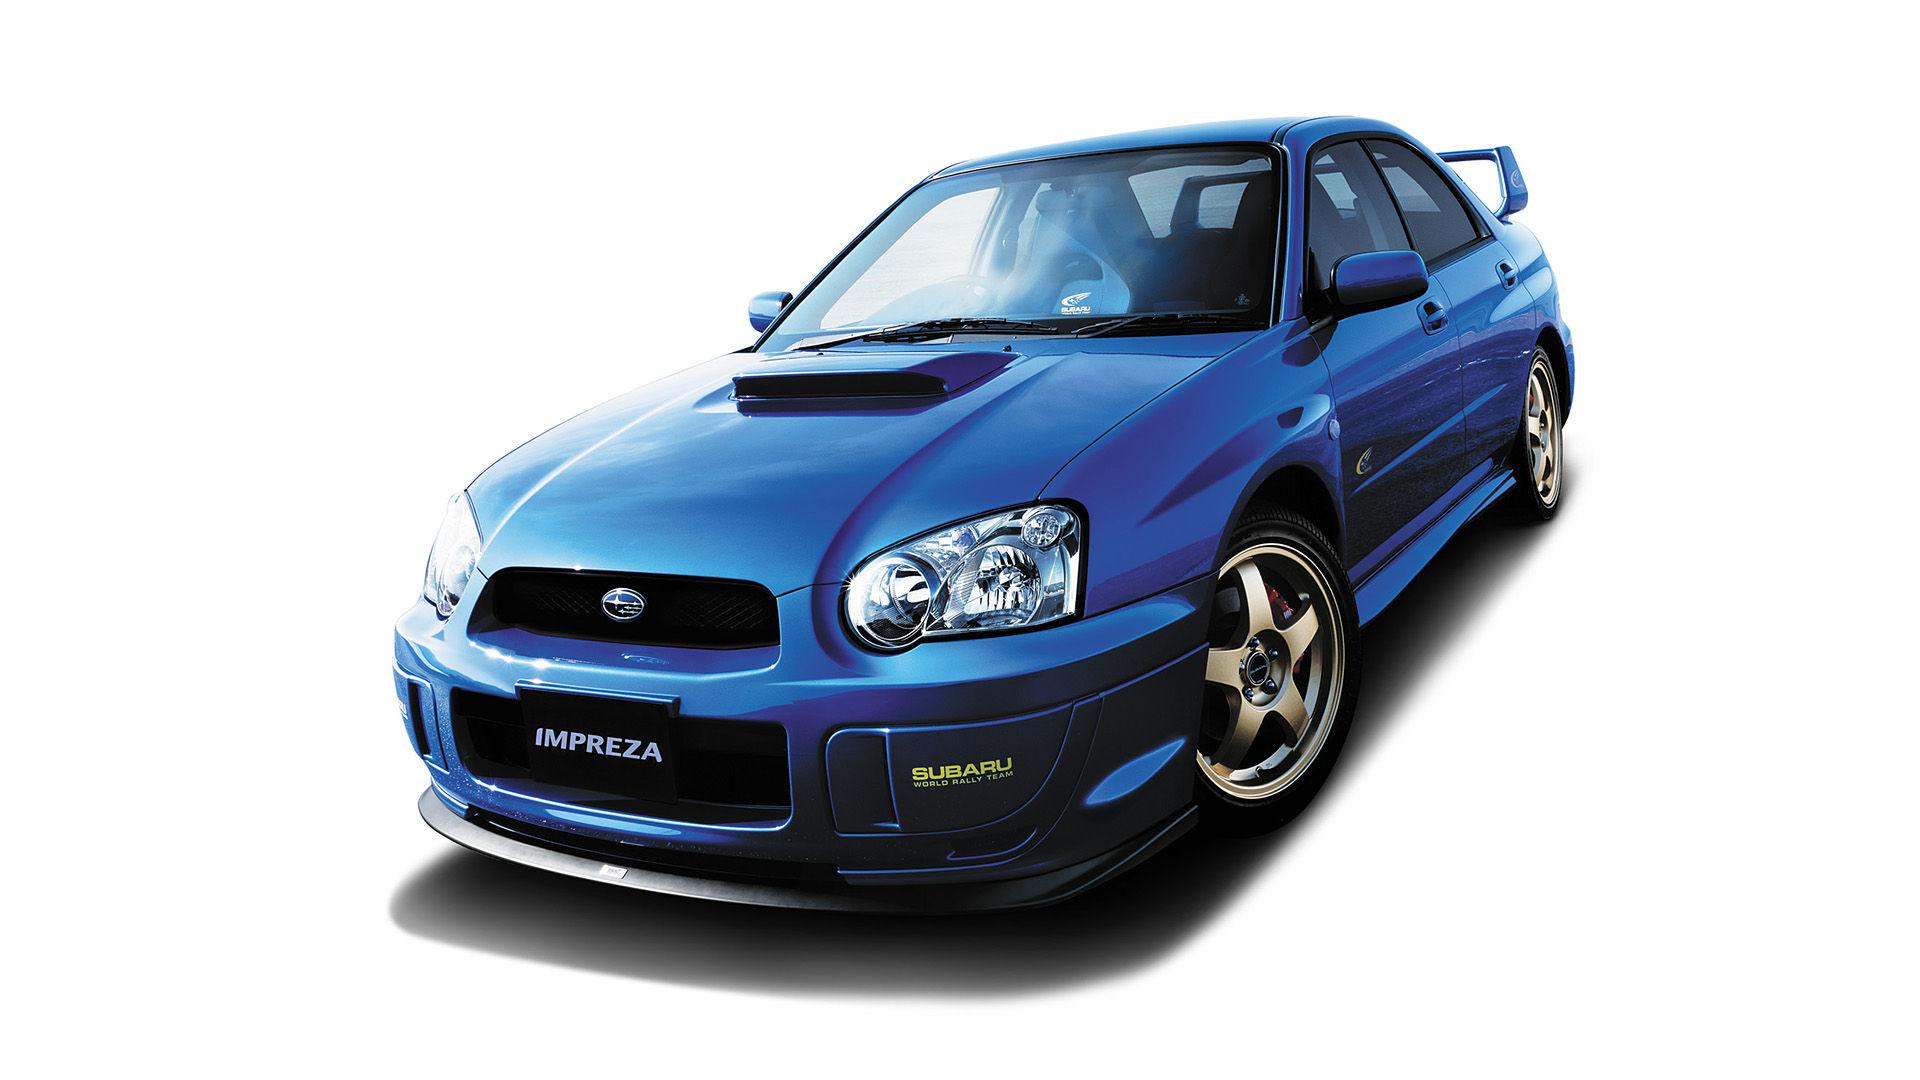 2004 Subaru Impreza WRX STI Spec C